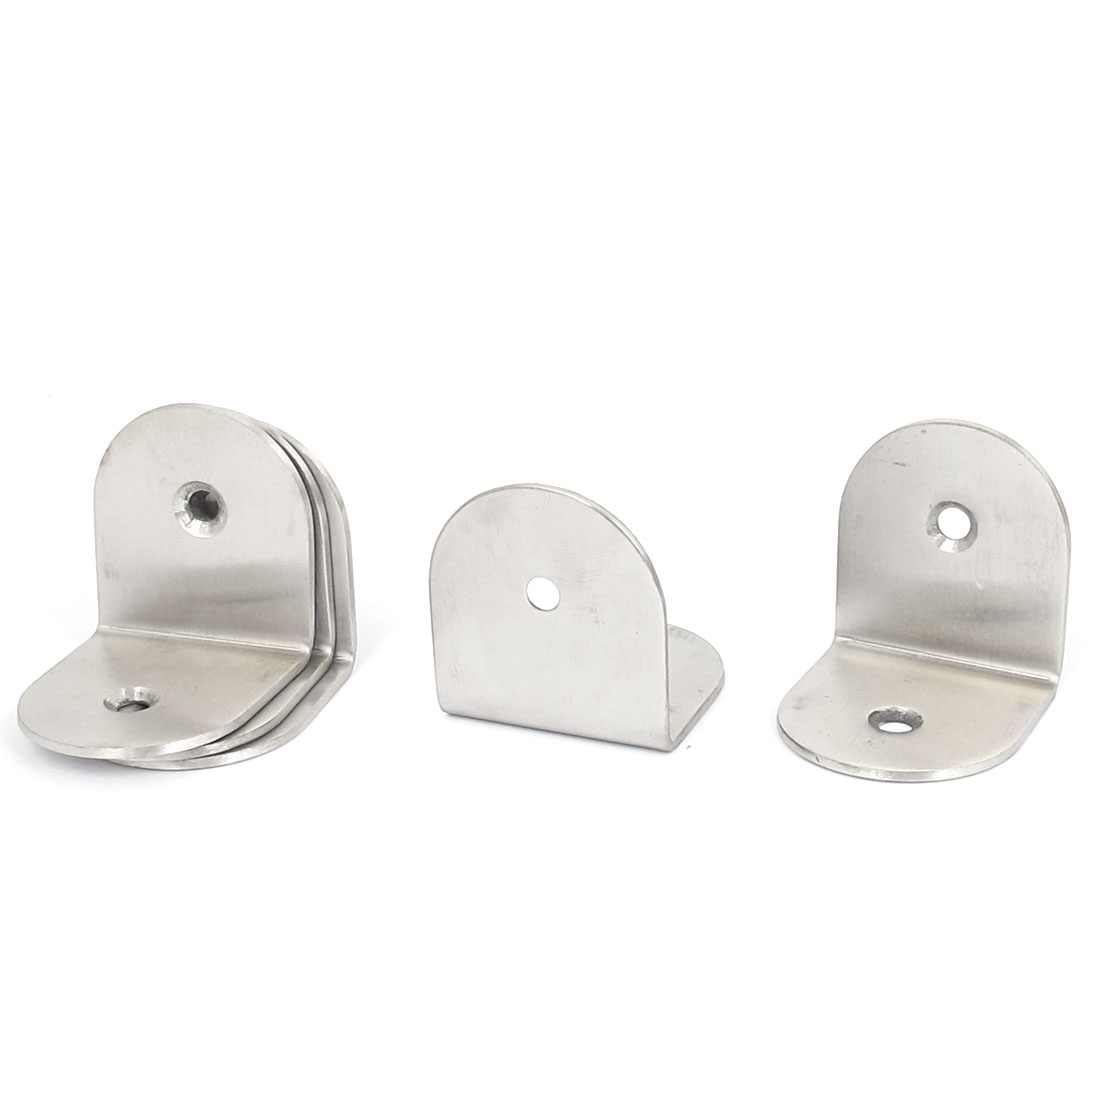 40mmx40mm L Shape Stainless Steel Shelf Corner Brace Repair Angle Bracket 5pcs